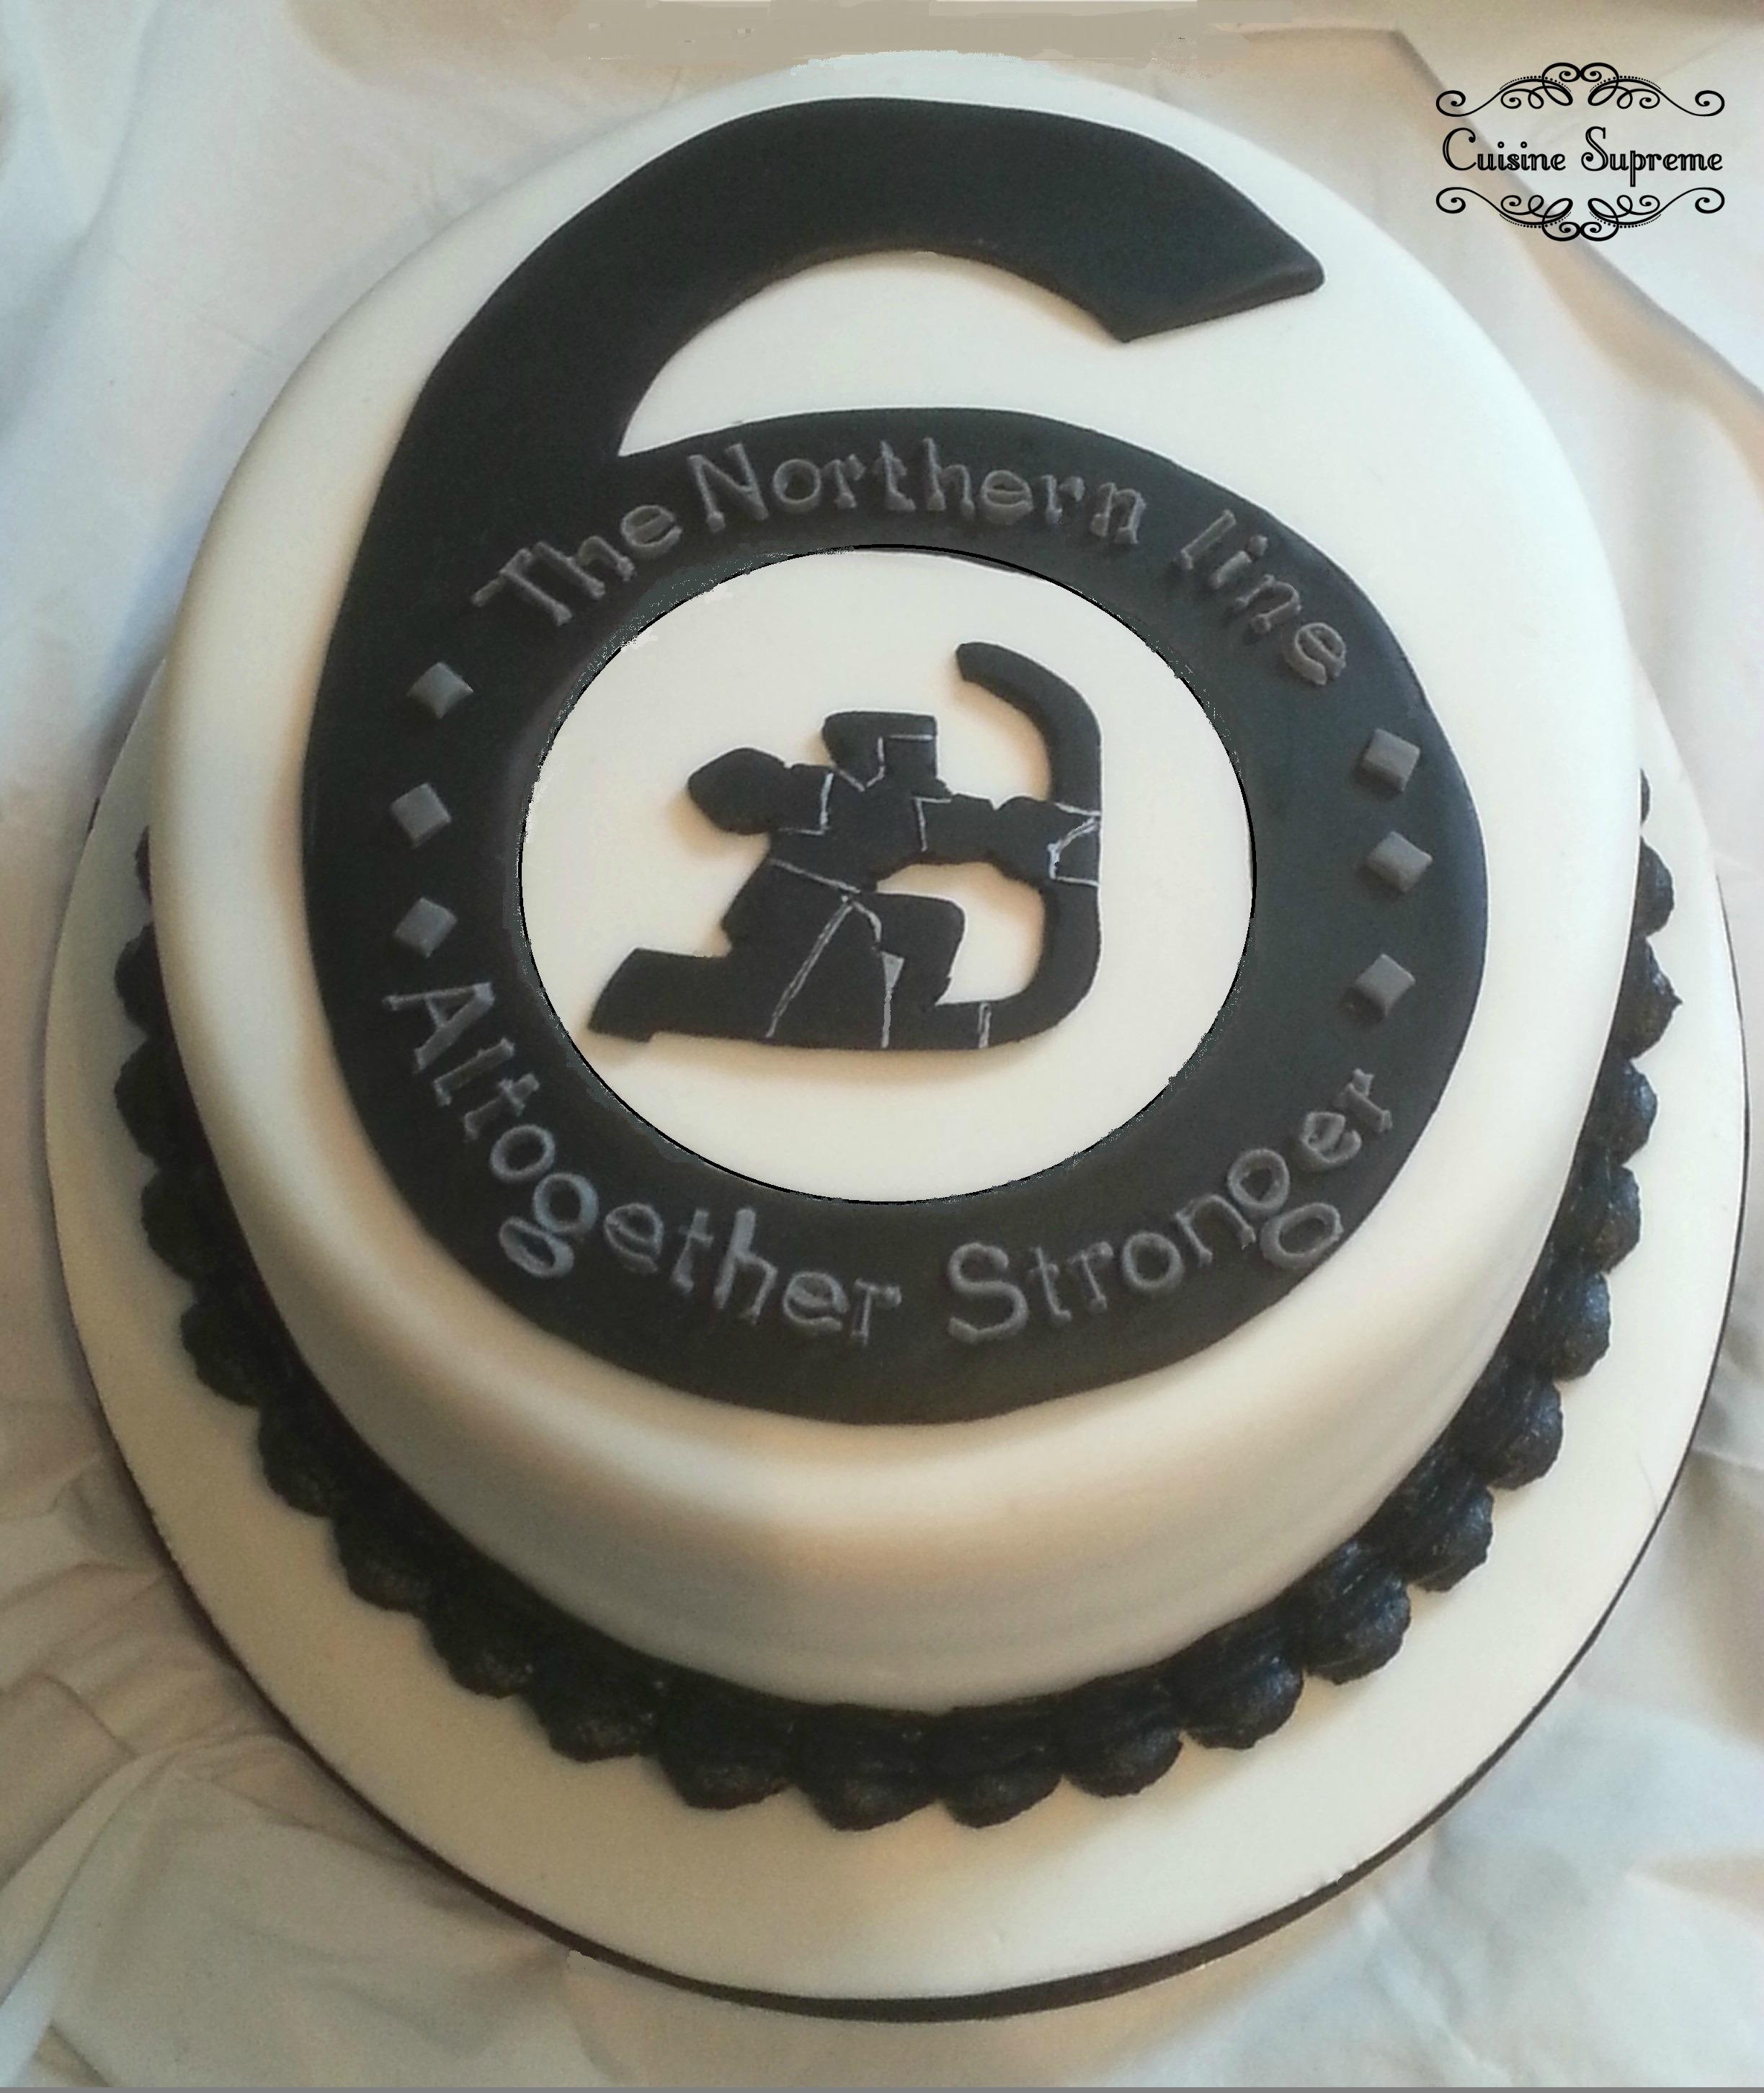 London Underground Cake